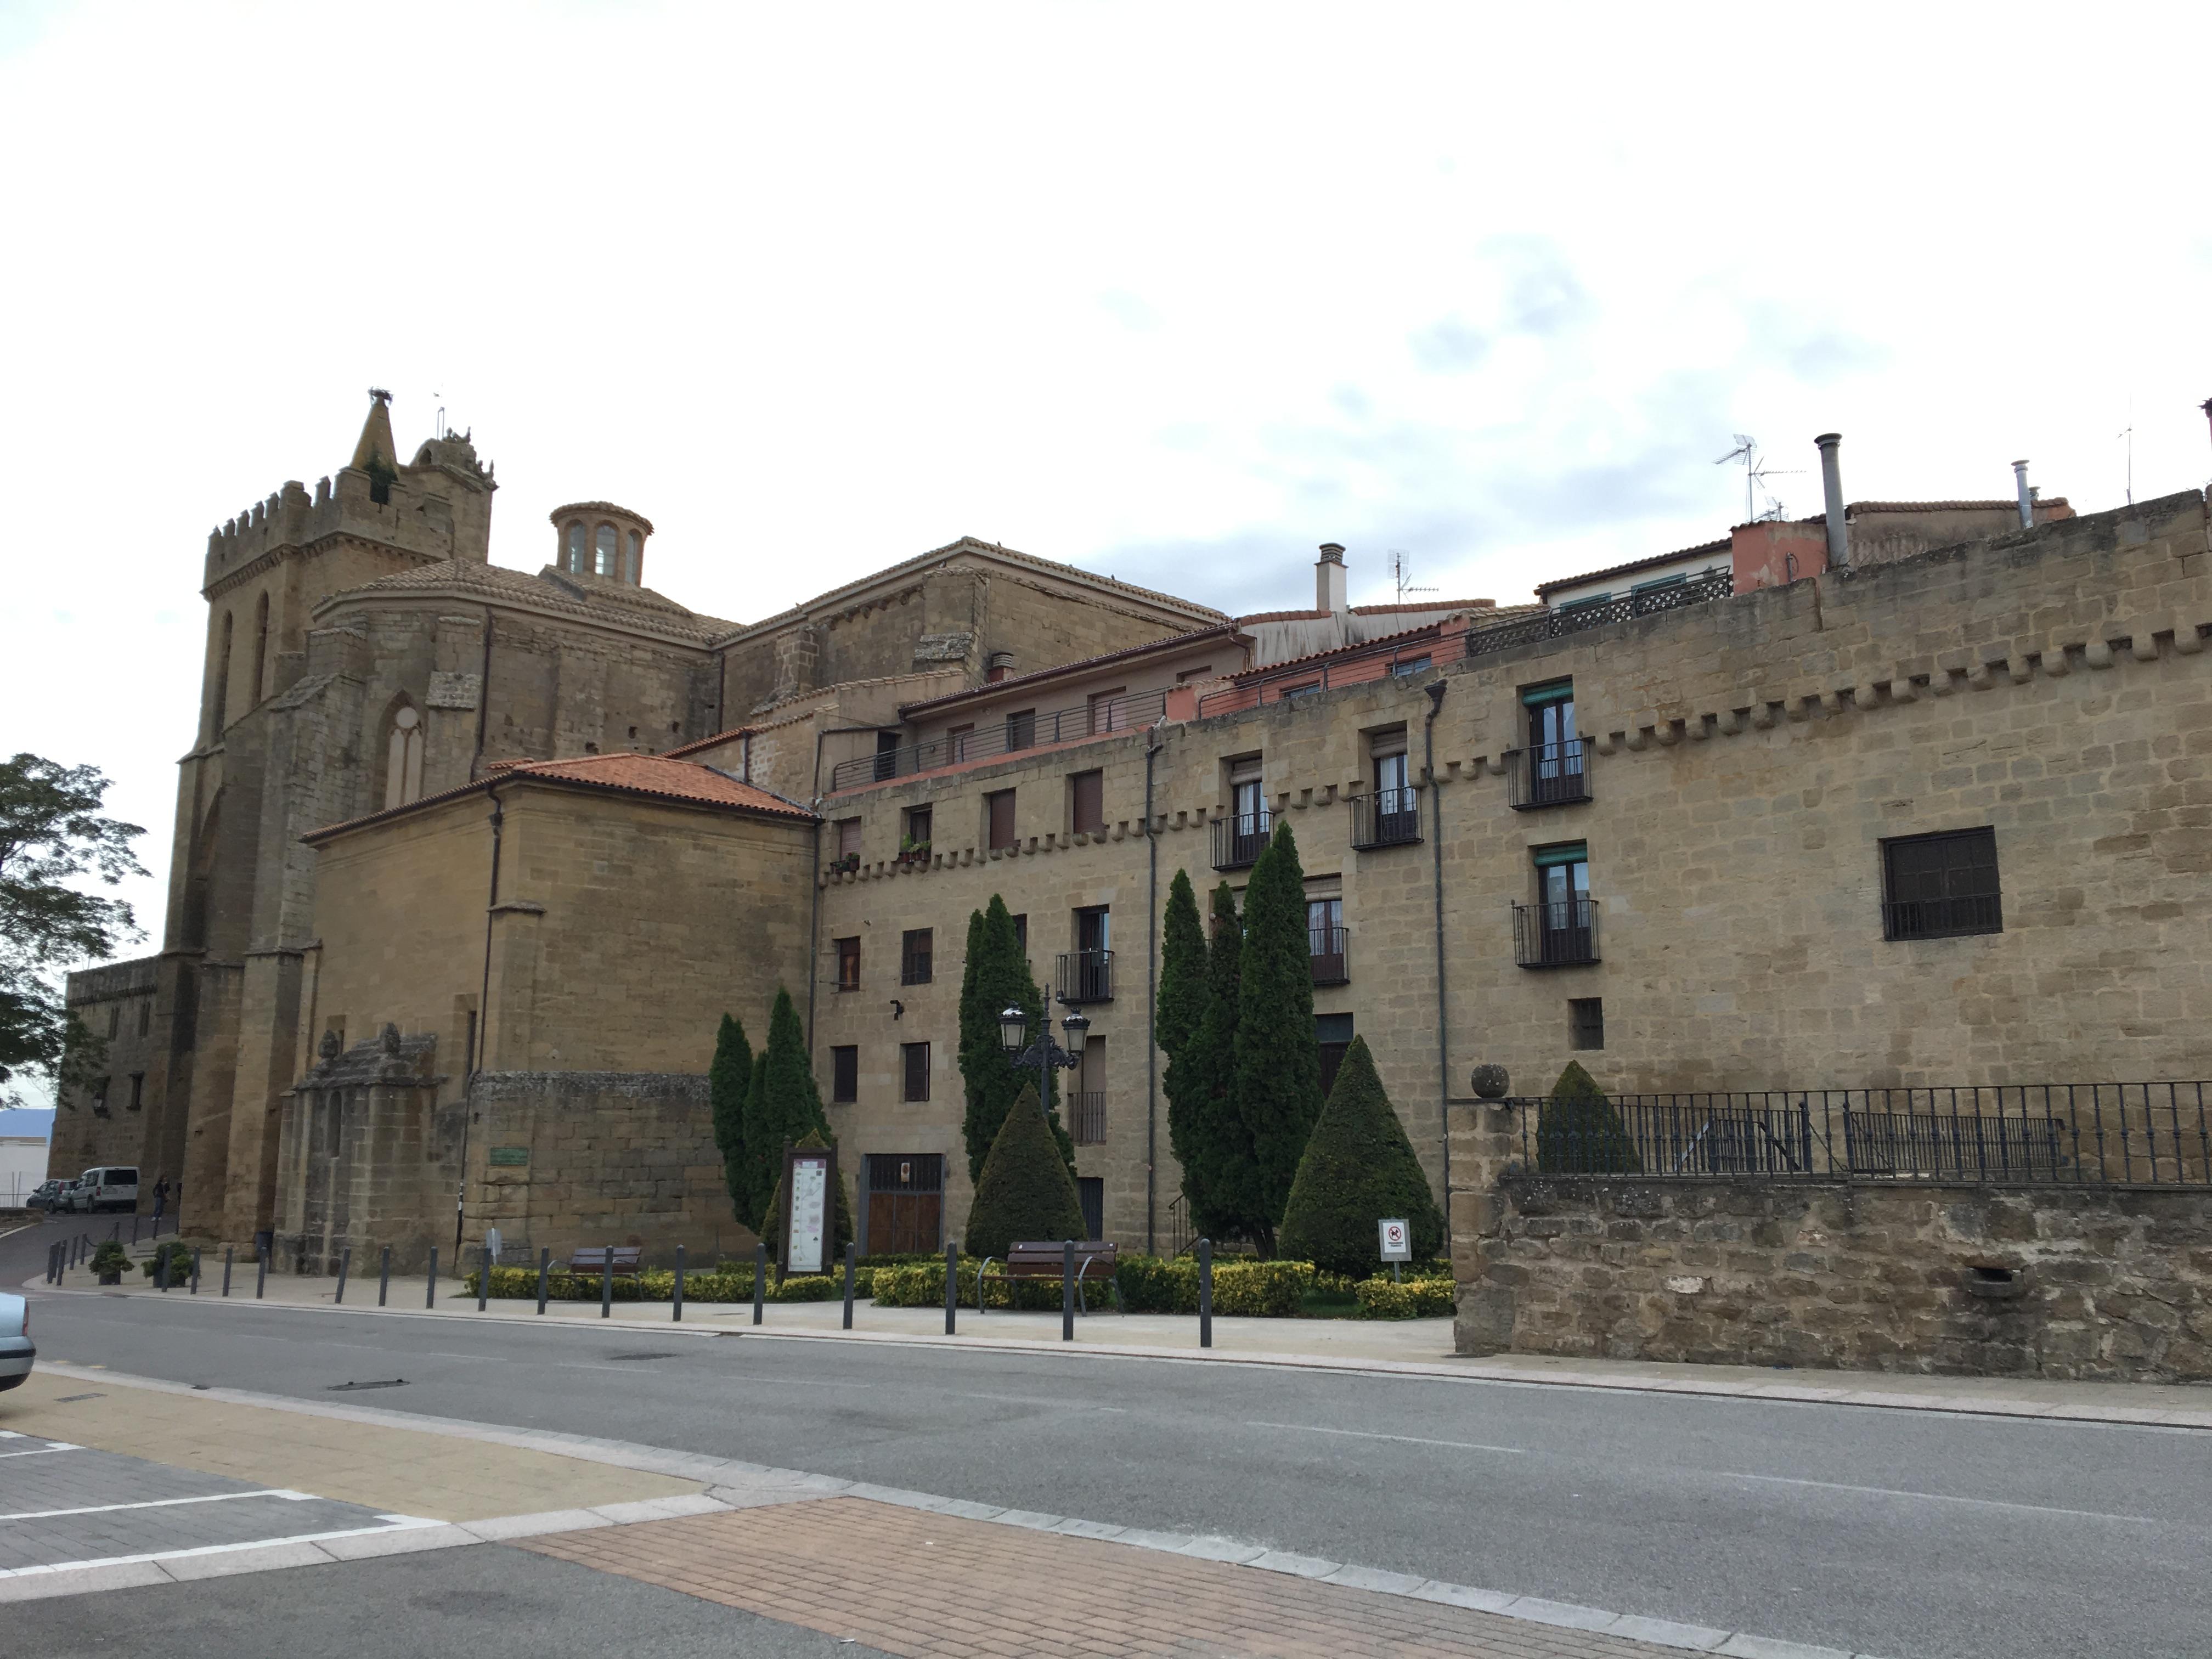 Ferienhaus Casa Rural Lasai Haus (2684718), Biasteri, Alava, Baskenland, Spanien, Bild 22